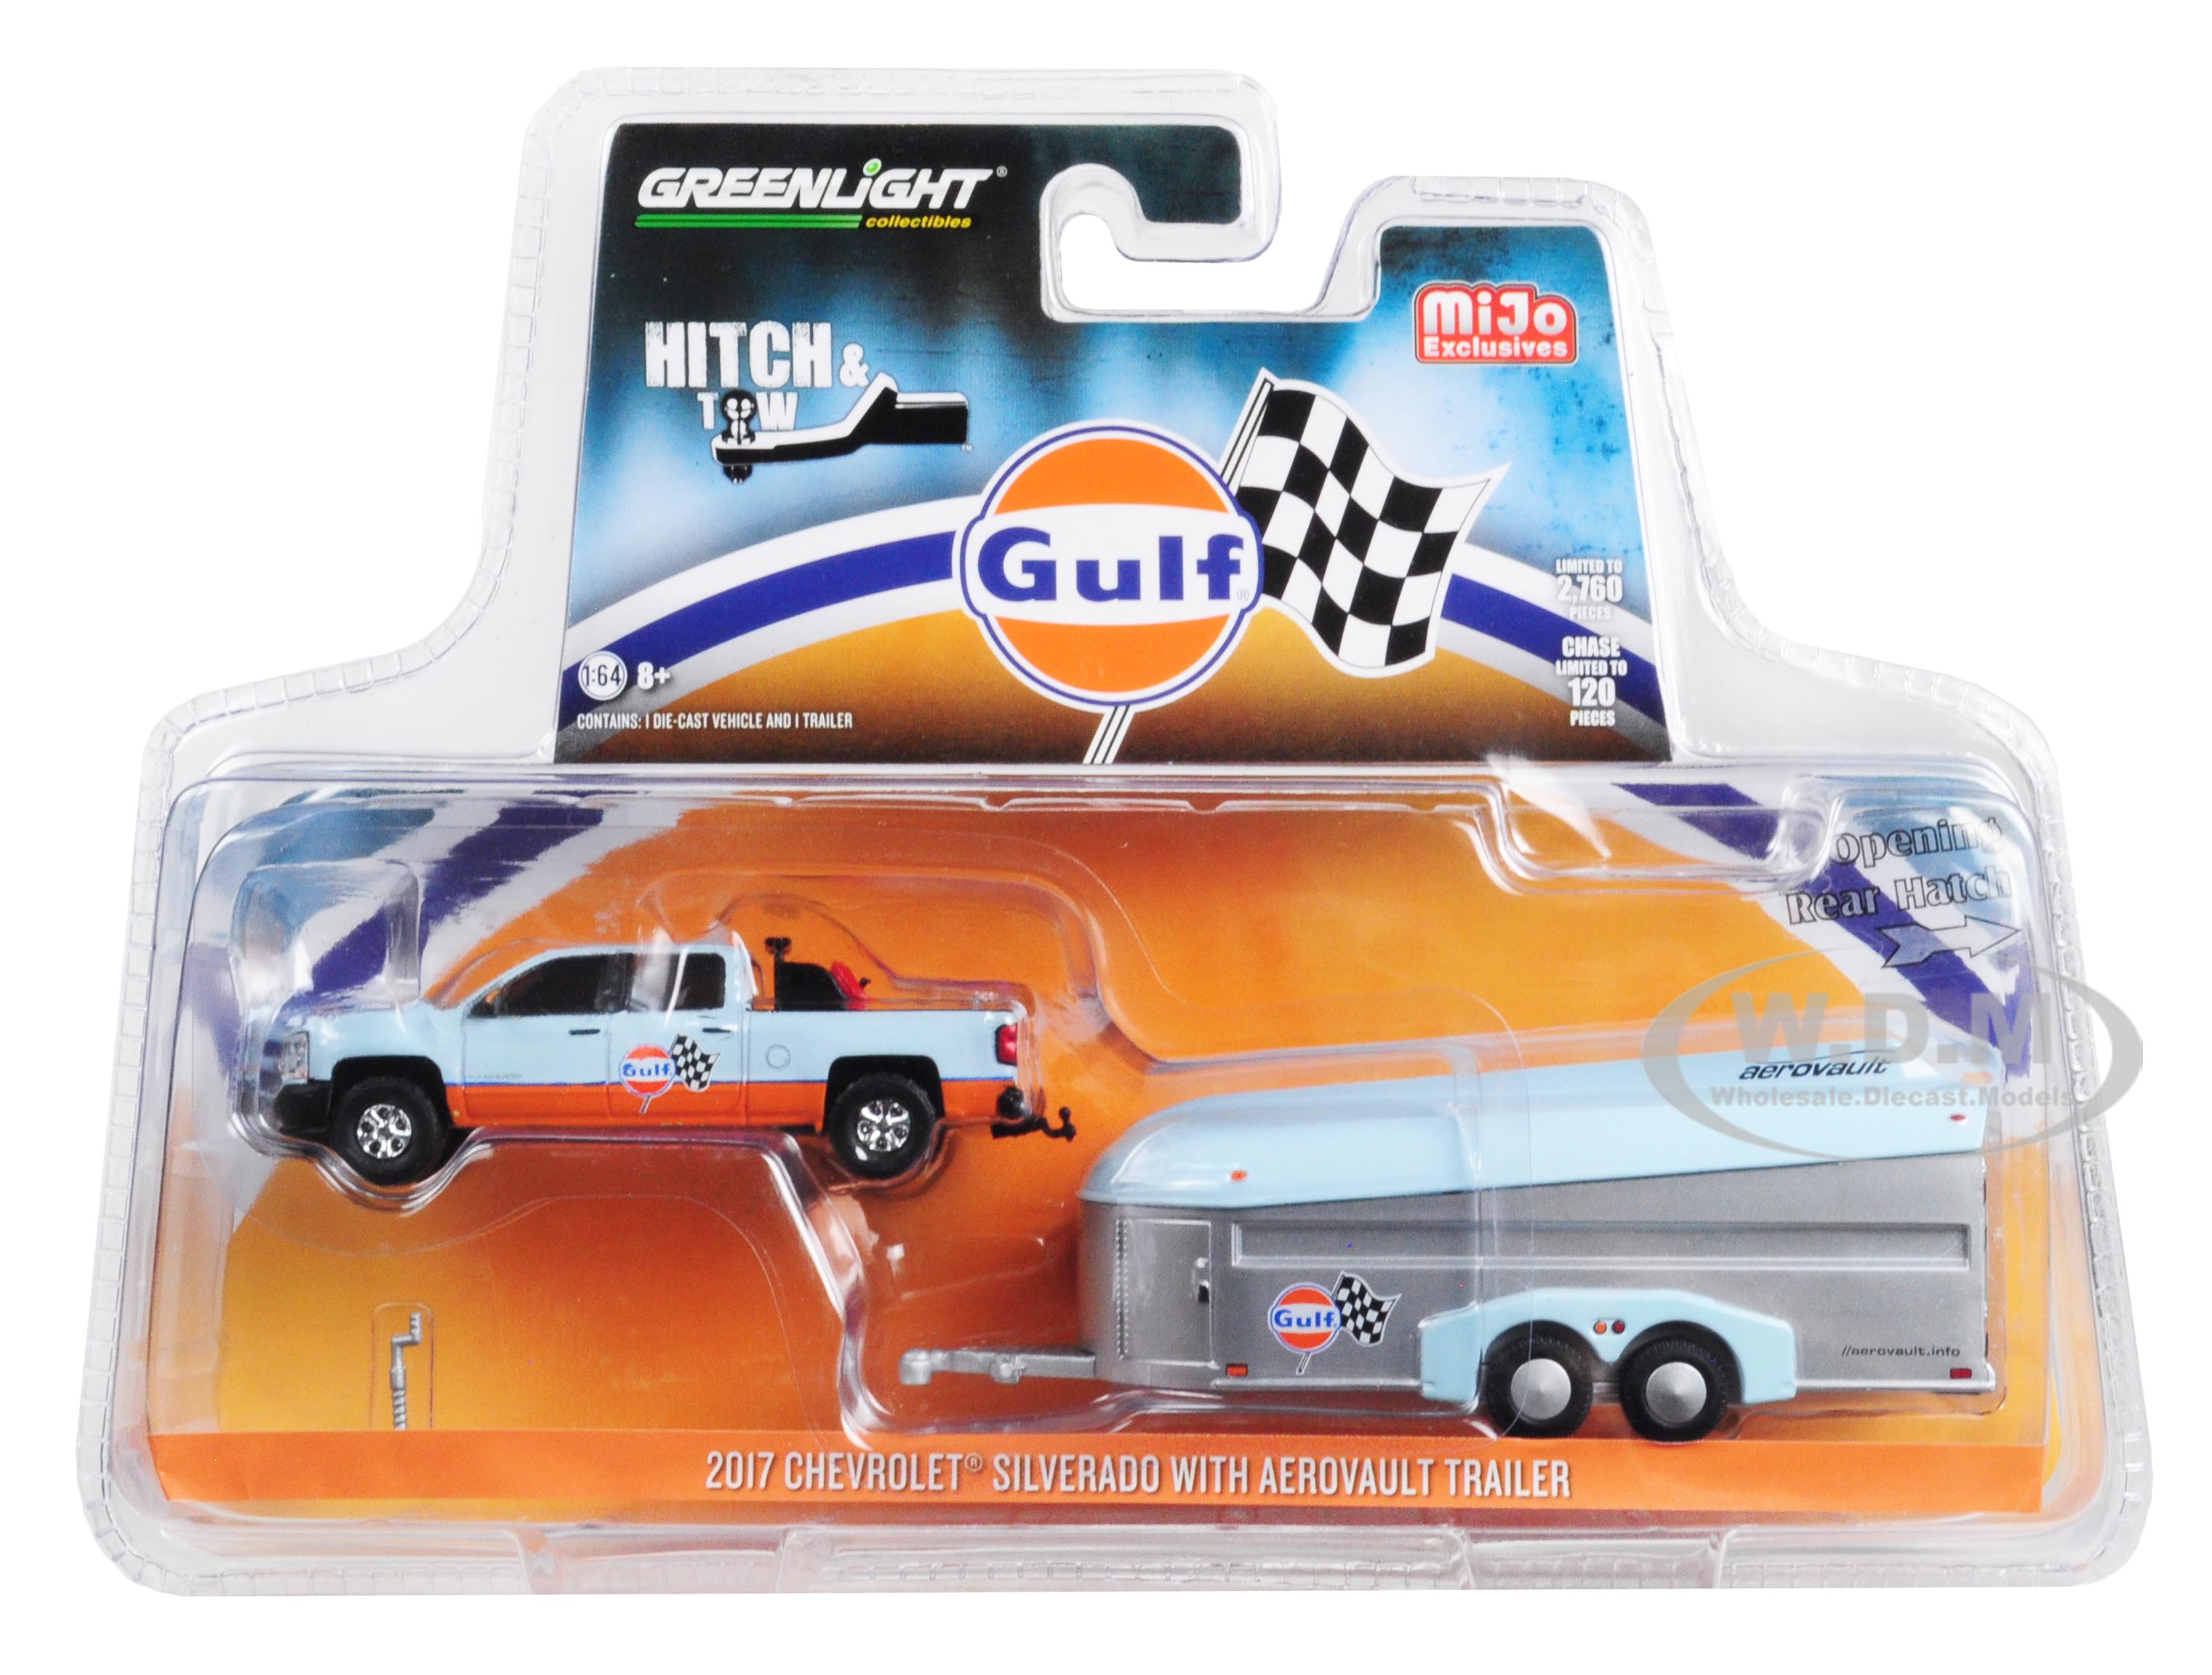 2017 Chevrolet Silverado Pickup Truck and Aerovault Trailer